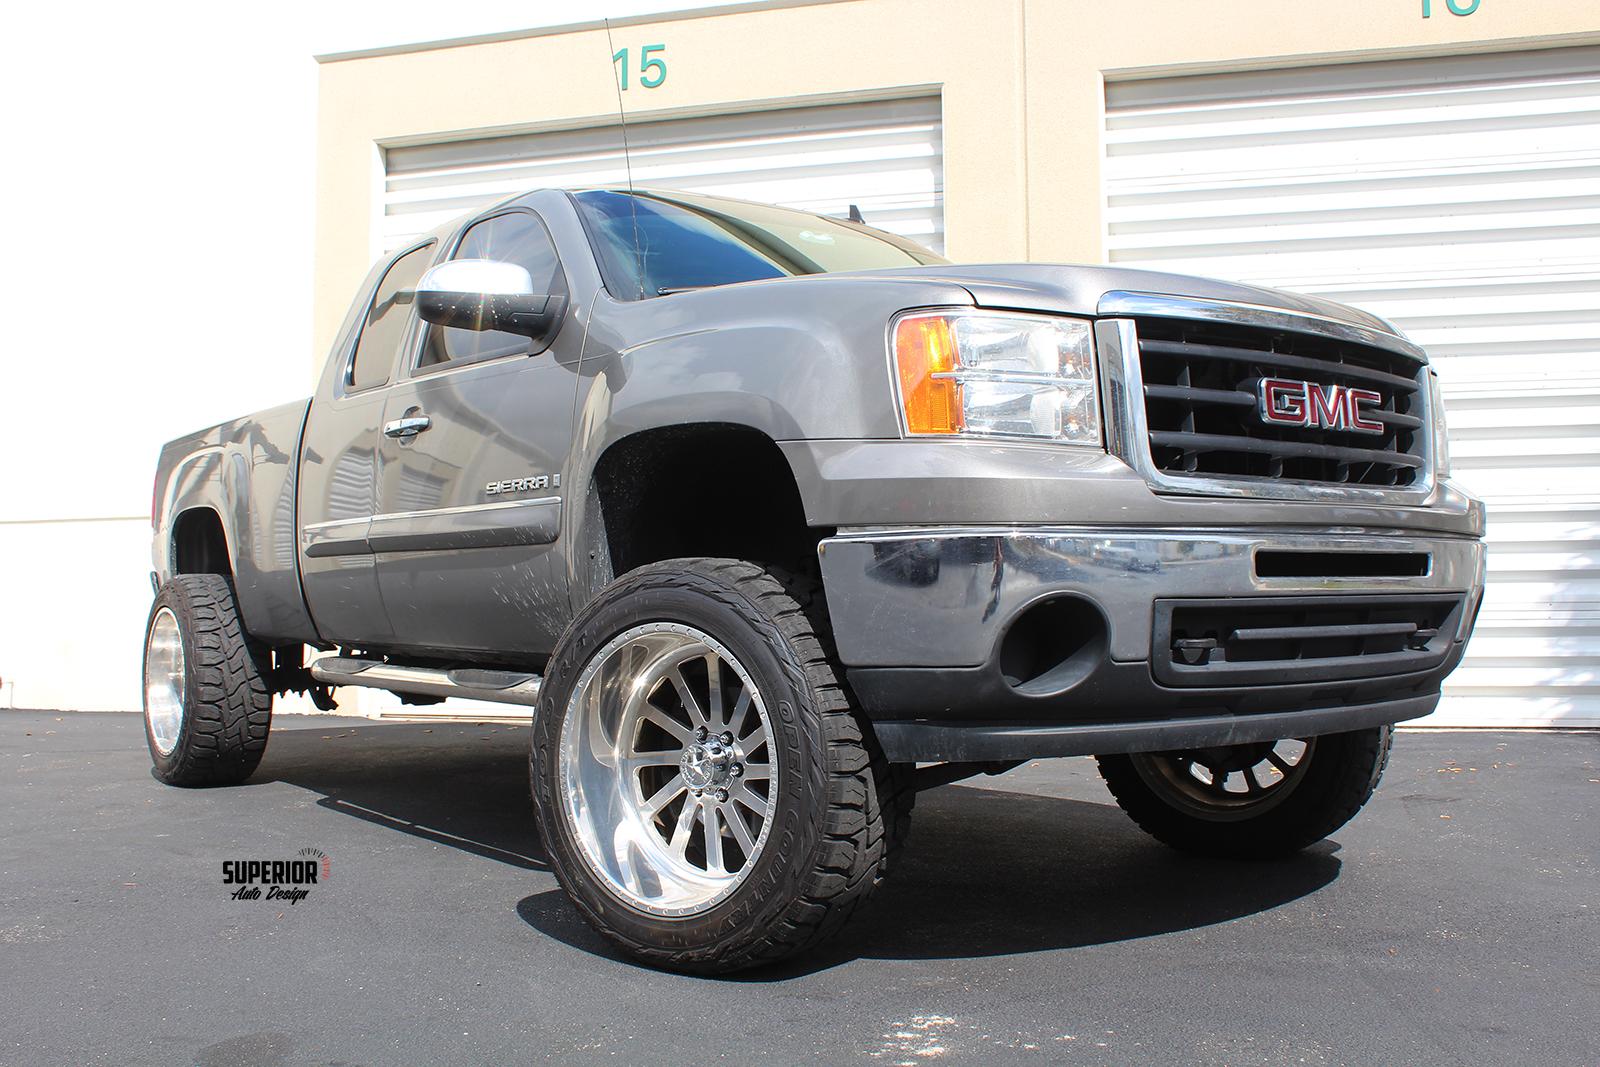 sierra lifted truck superior auto design 5